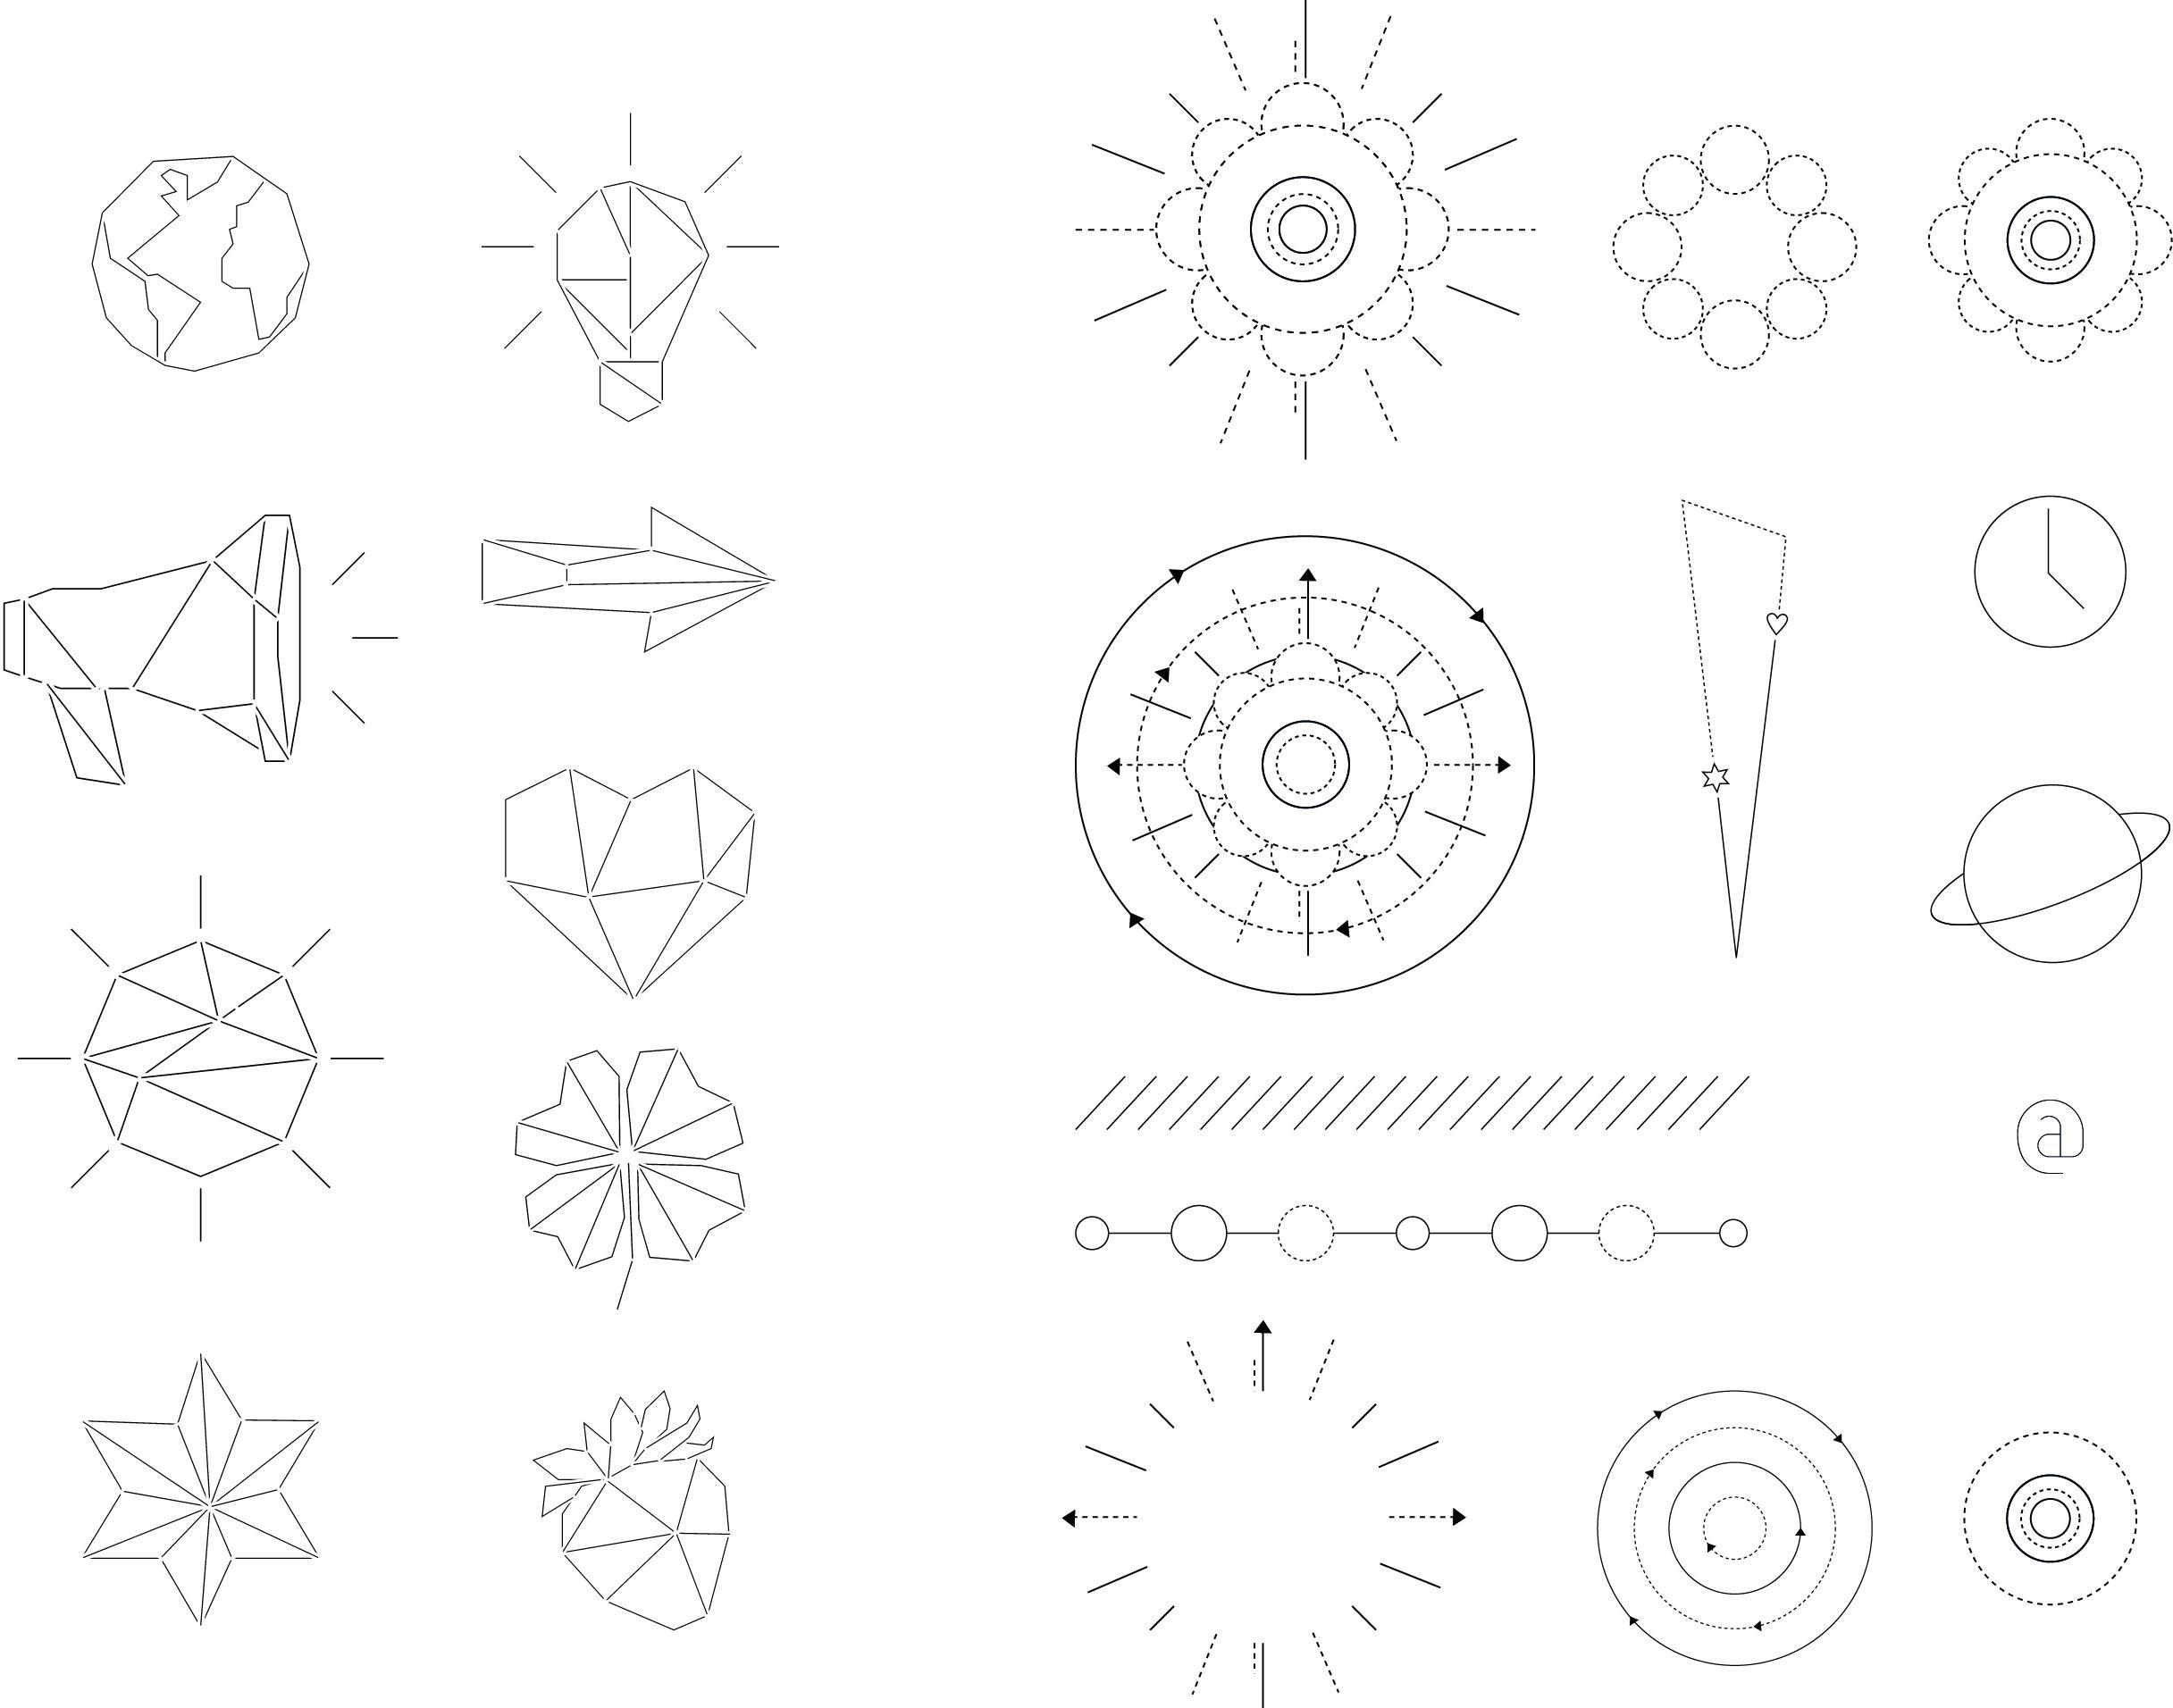 Design Studio Process - image 2 - student project